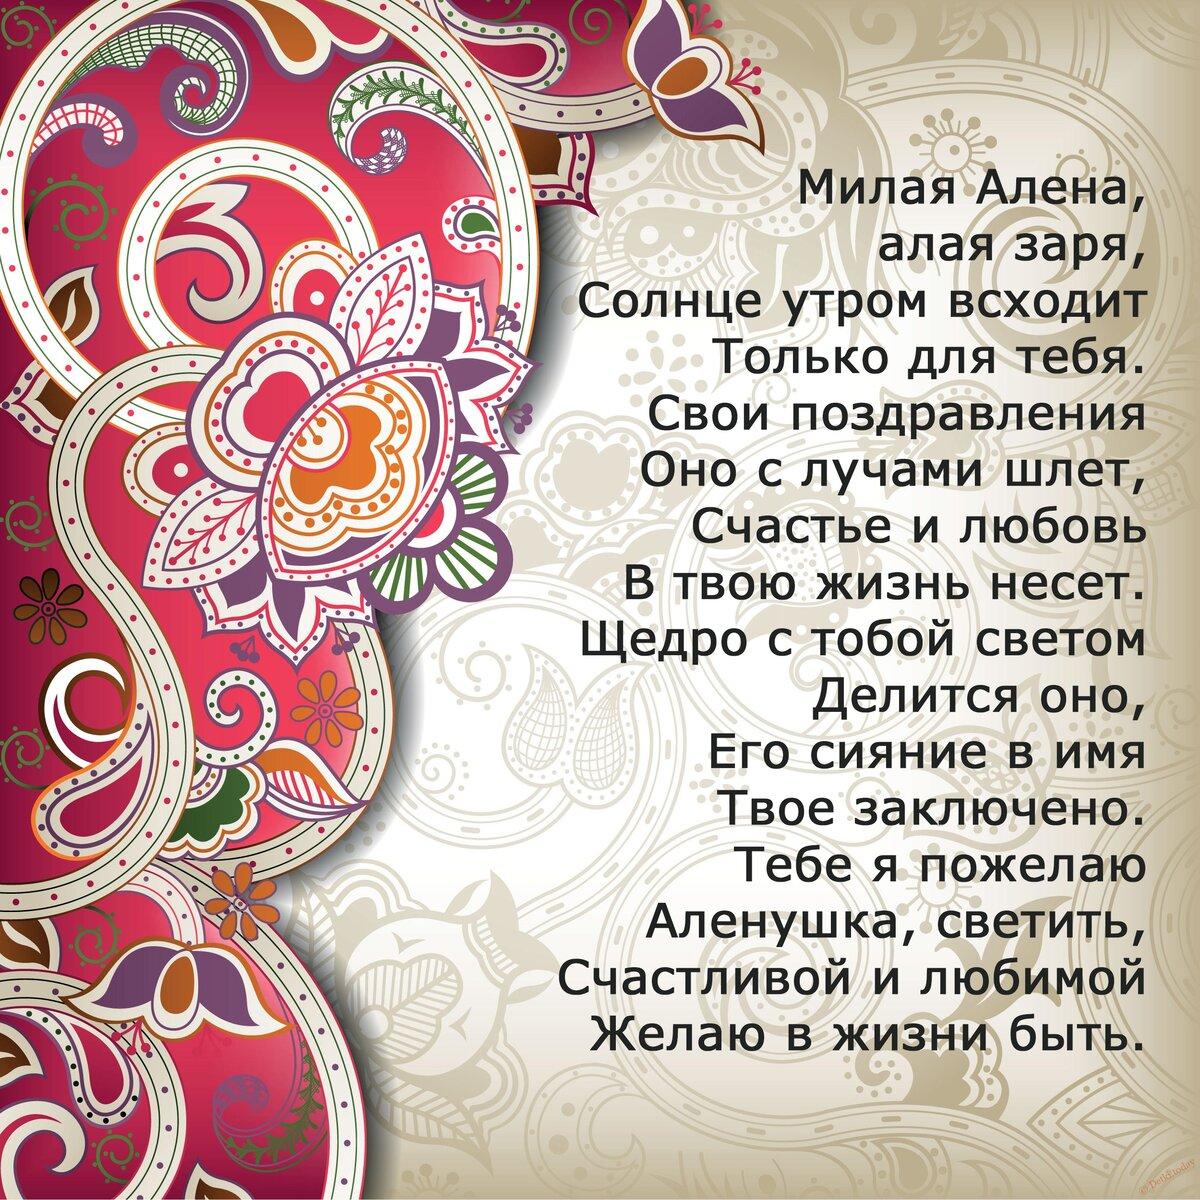 Стихи на имя алена про любовь